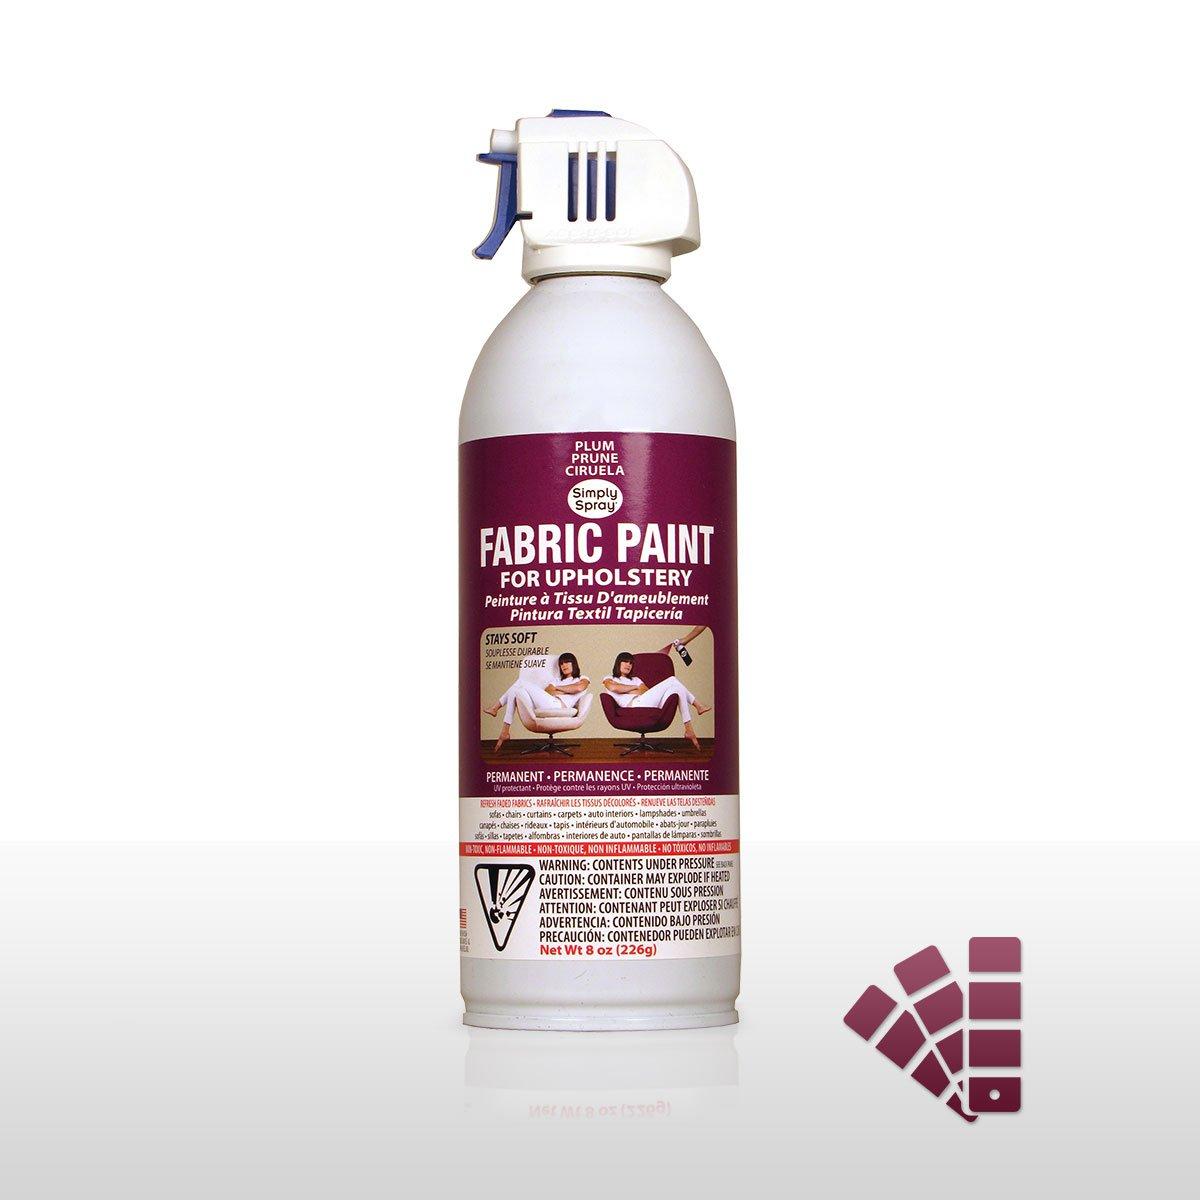 Plum - Upholstery Spray Paint